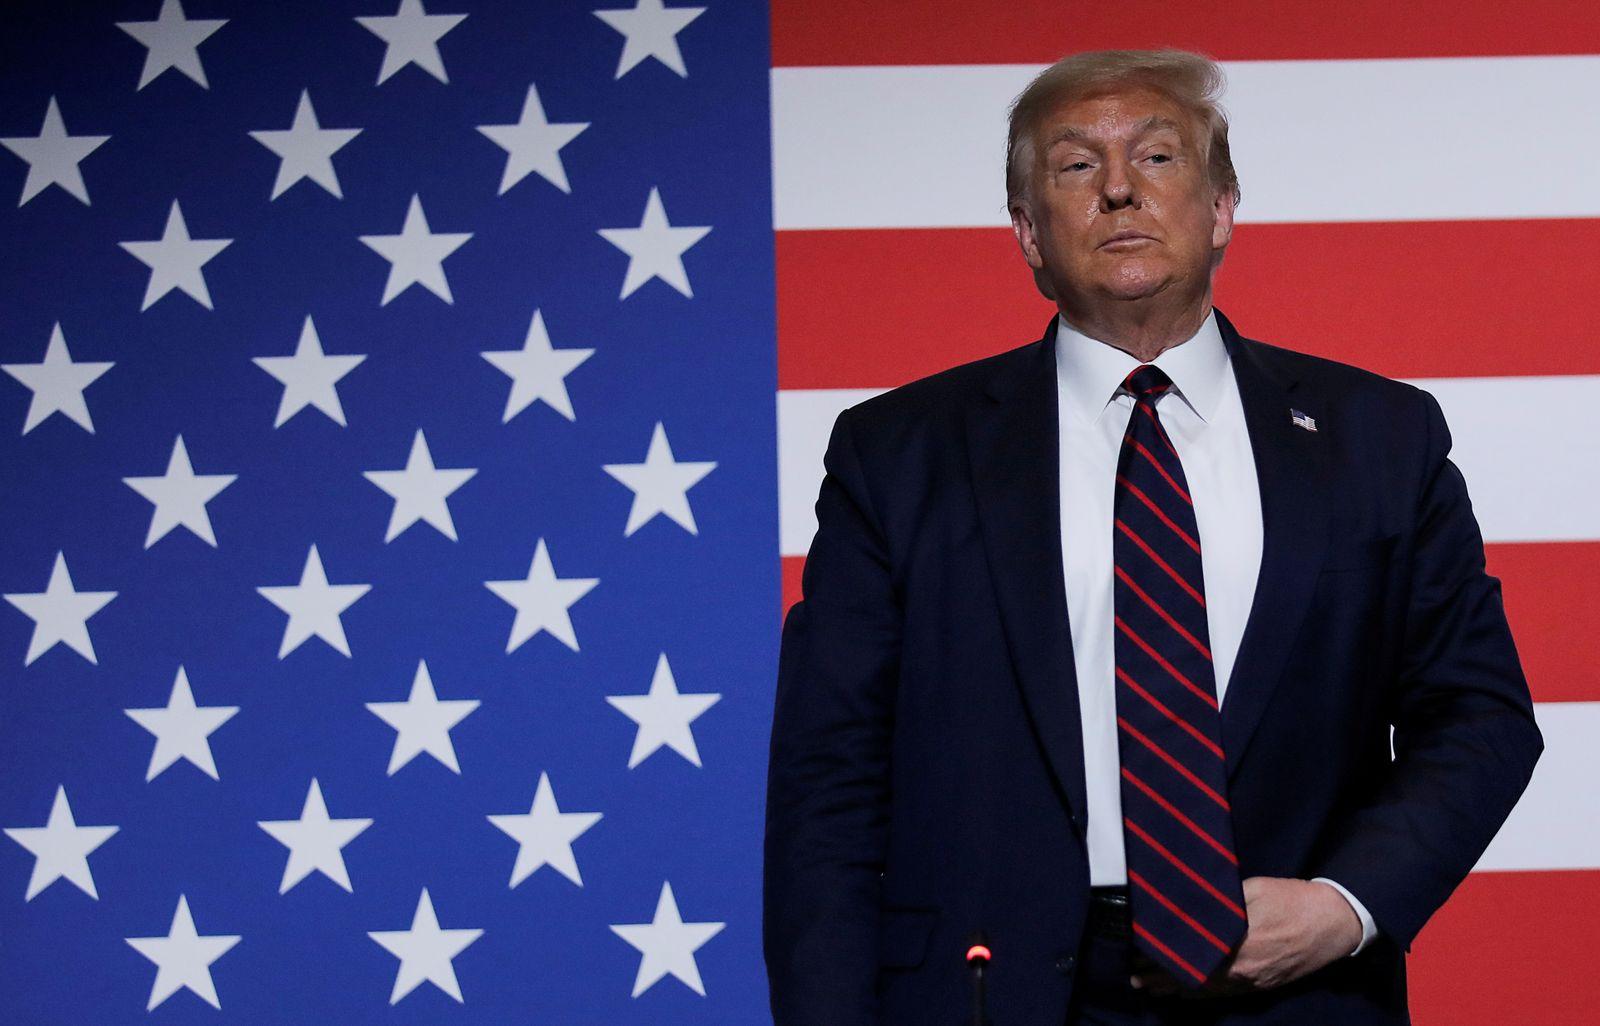 U.S. President Trump visits American Red Cross National Headquarters in Washington